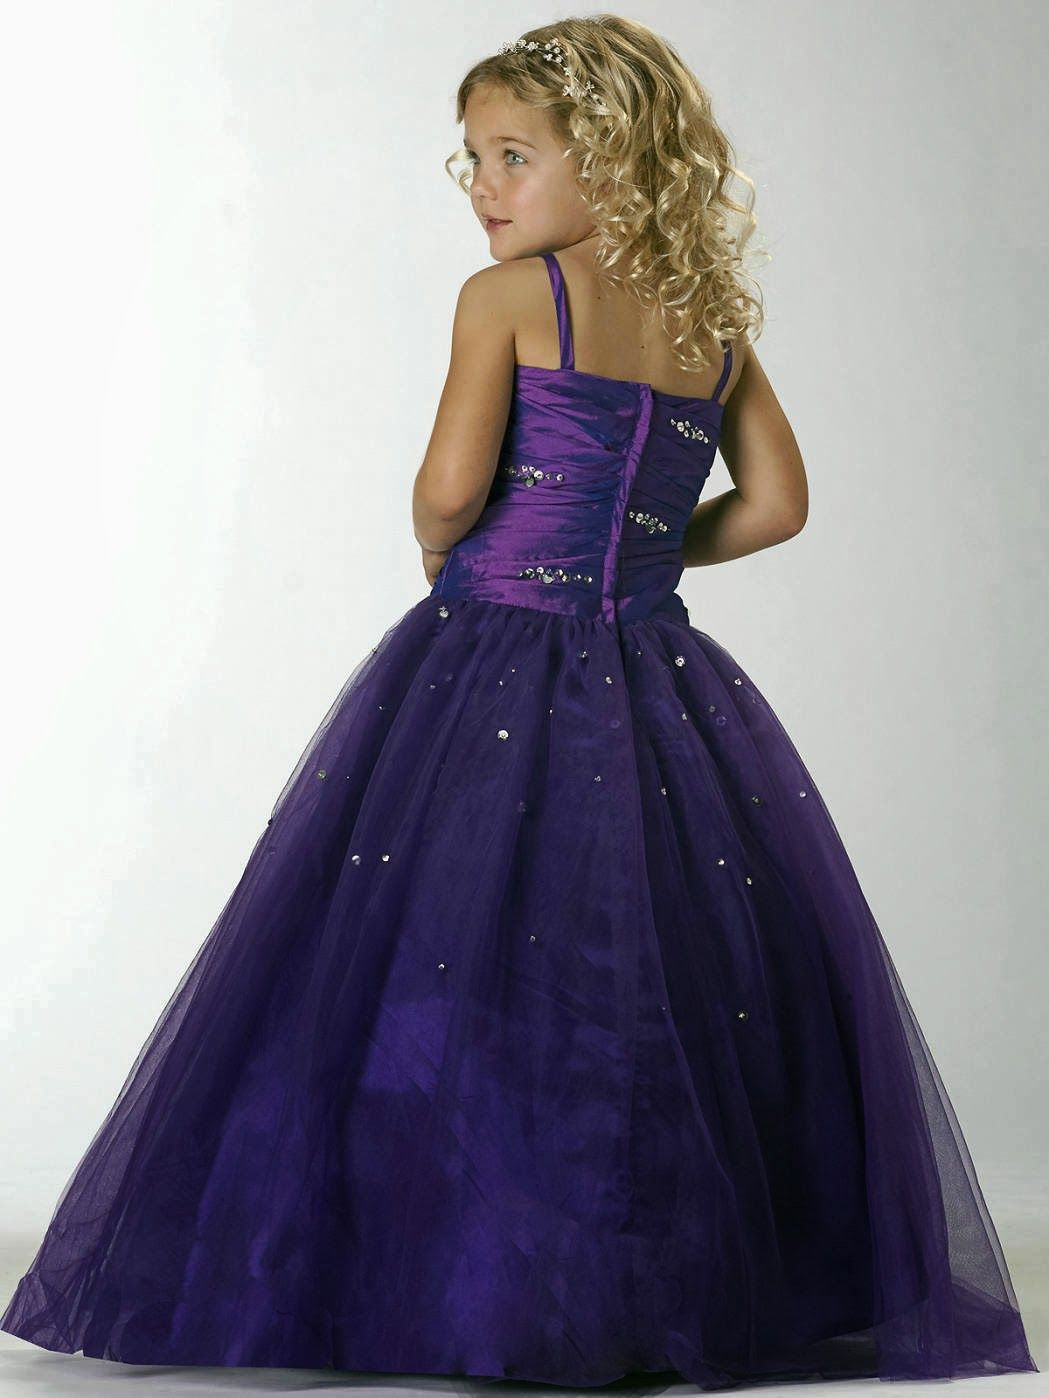 Lindos vestidos de fiesta para nia moda y tendencias nias deep purple flower girl dresses wedding and bridal inspiration lindos vestidos de fiesta para nia moda y tendencias izmirmasajfo